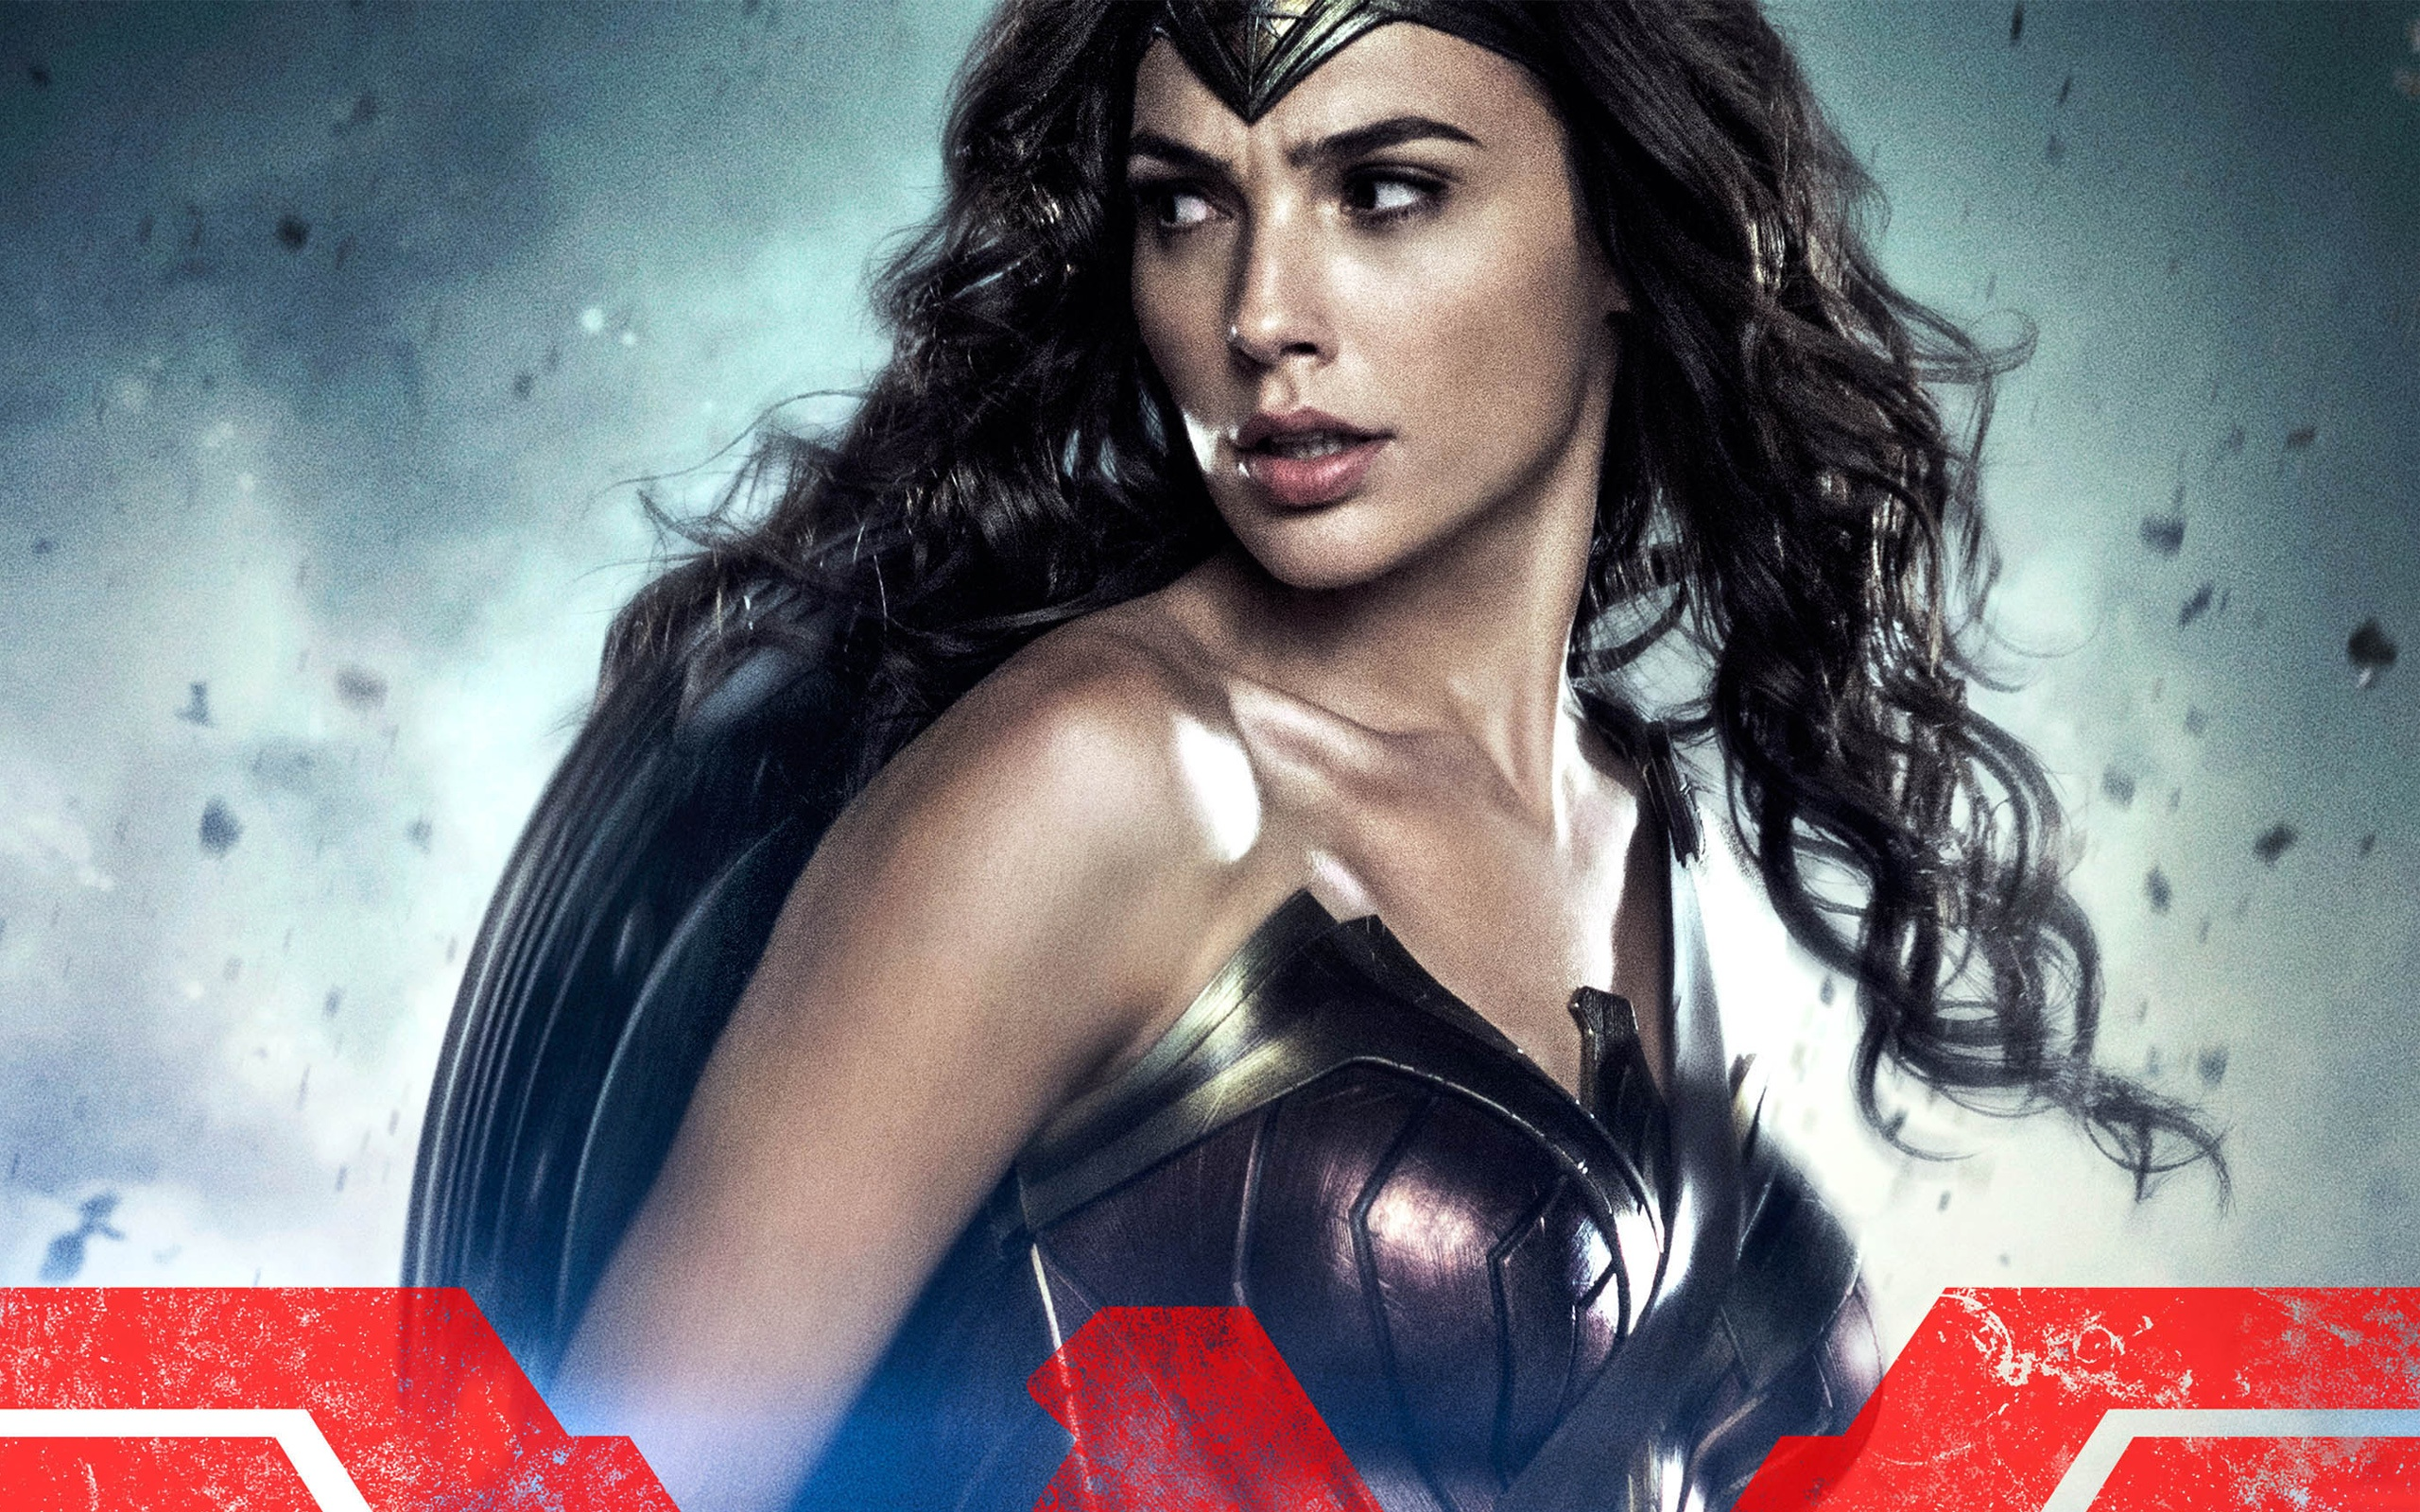 Batman V Superman Wonder Woman Wallpapers In Jpg Format For Free